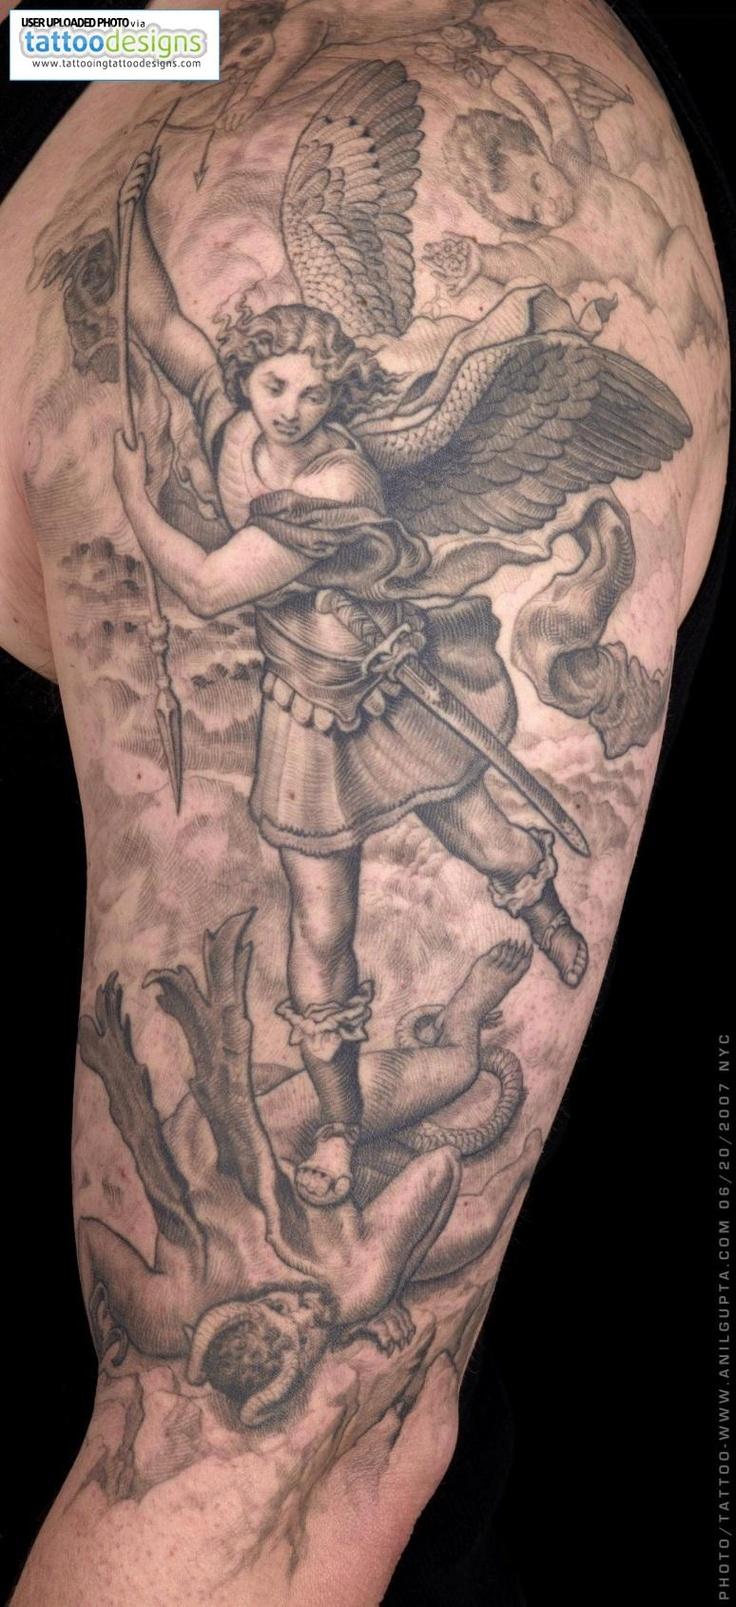 Archangel Michael Tattoos: St-michael-the-archangel